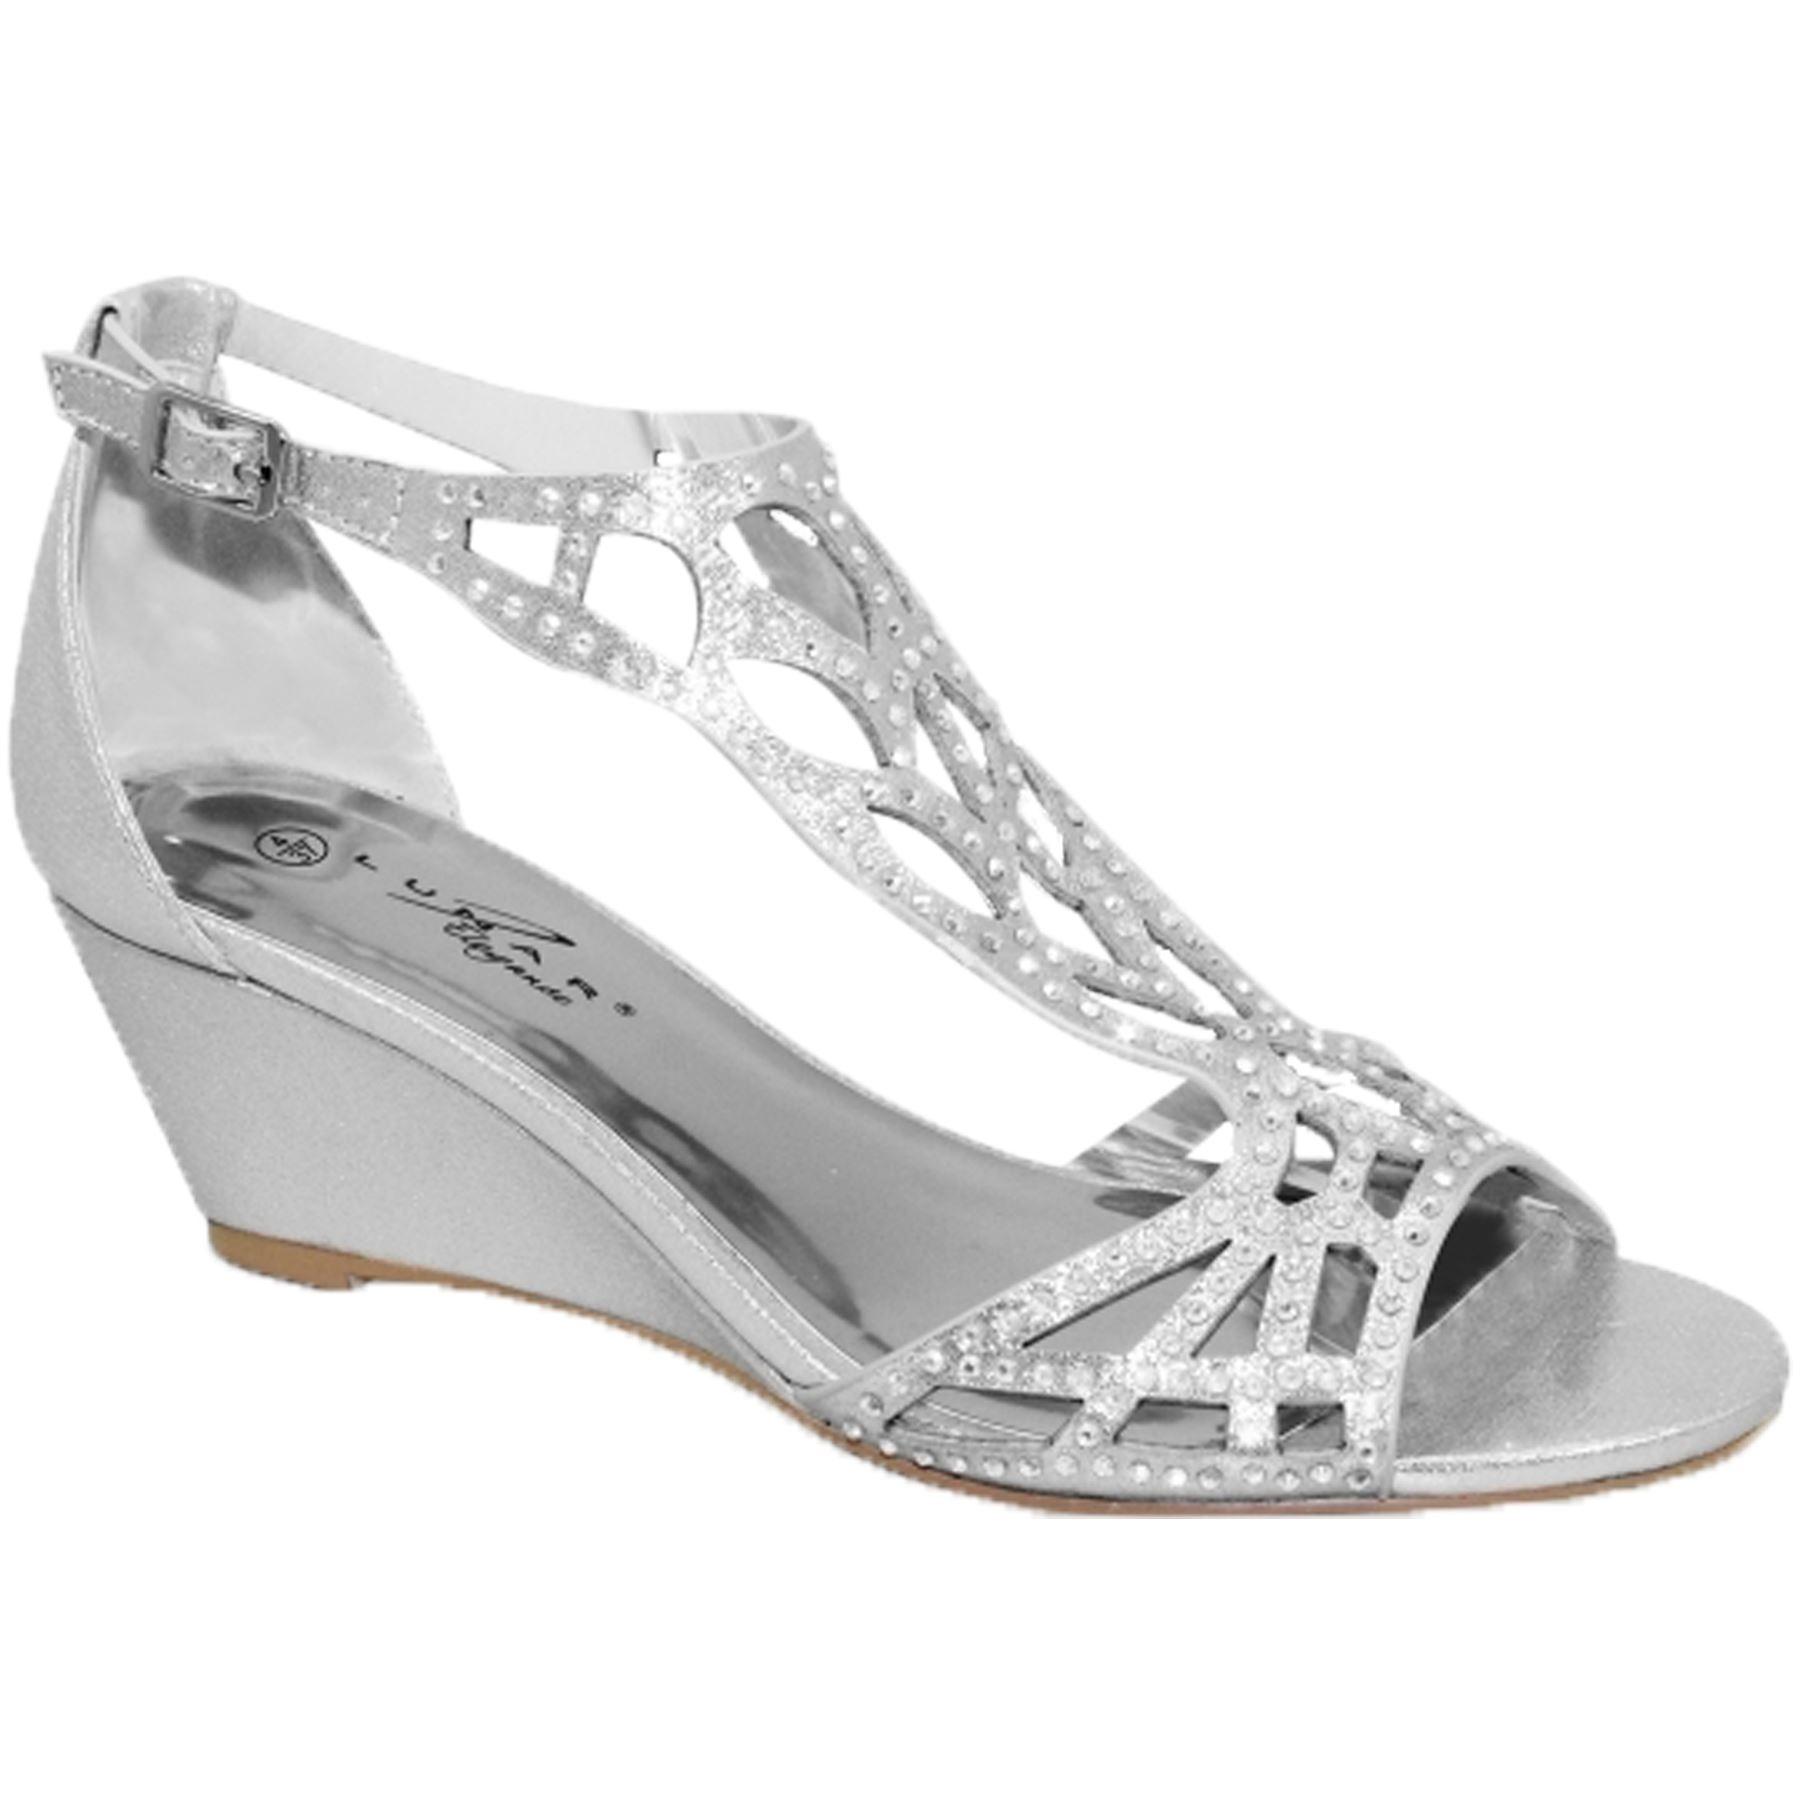 0b46d75f7 FLC111 Denton Rhinestone Strap Diamante Peep Toe Wedge Sandals ...